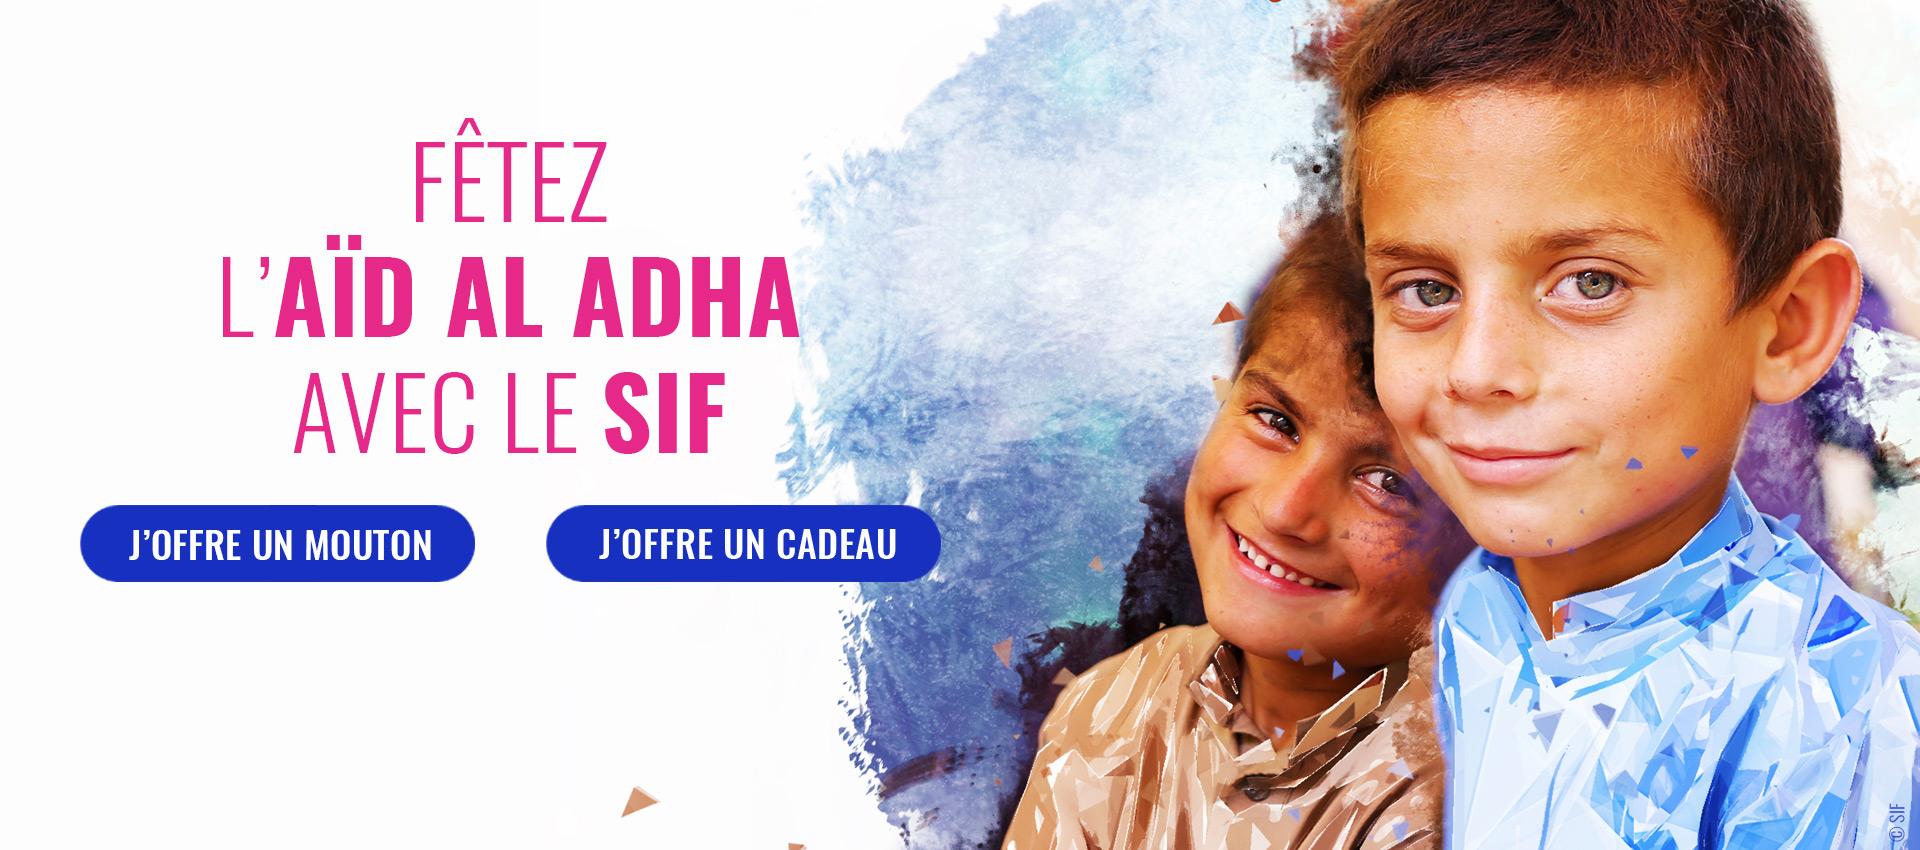 https://www.secours-islamique.org/images/Nouveau-site/carousel/big-ban-aidaladha-2019.jpg